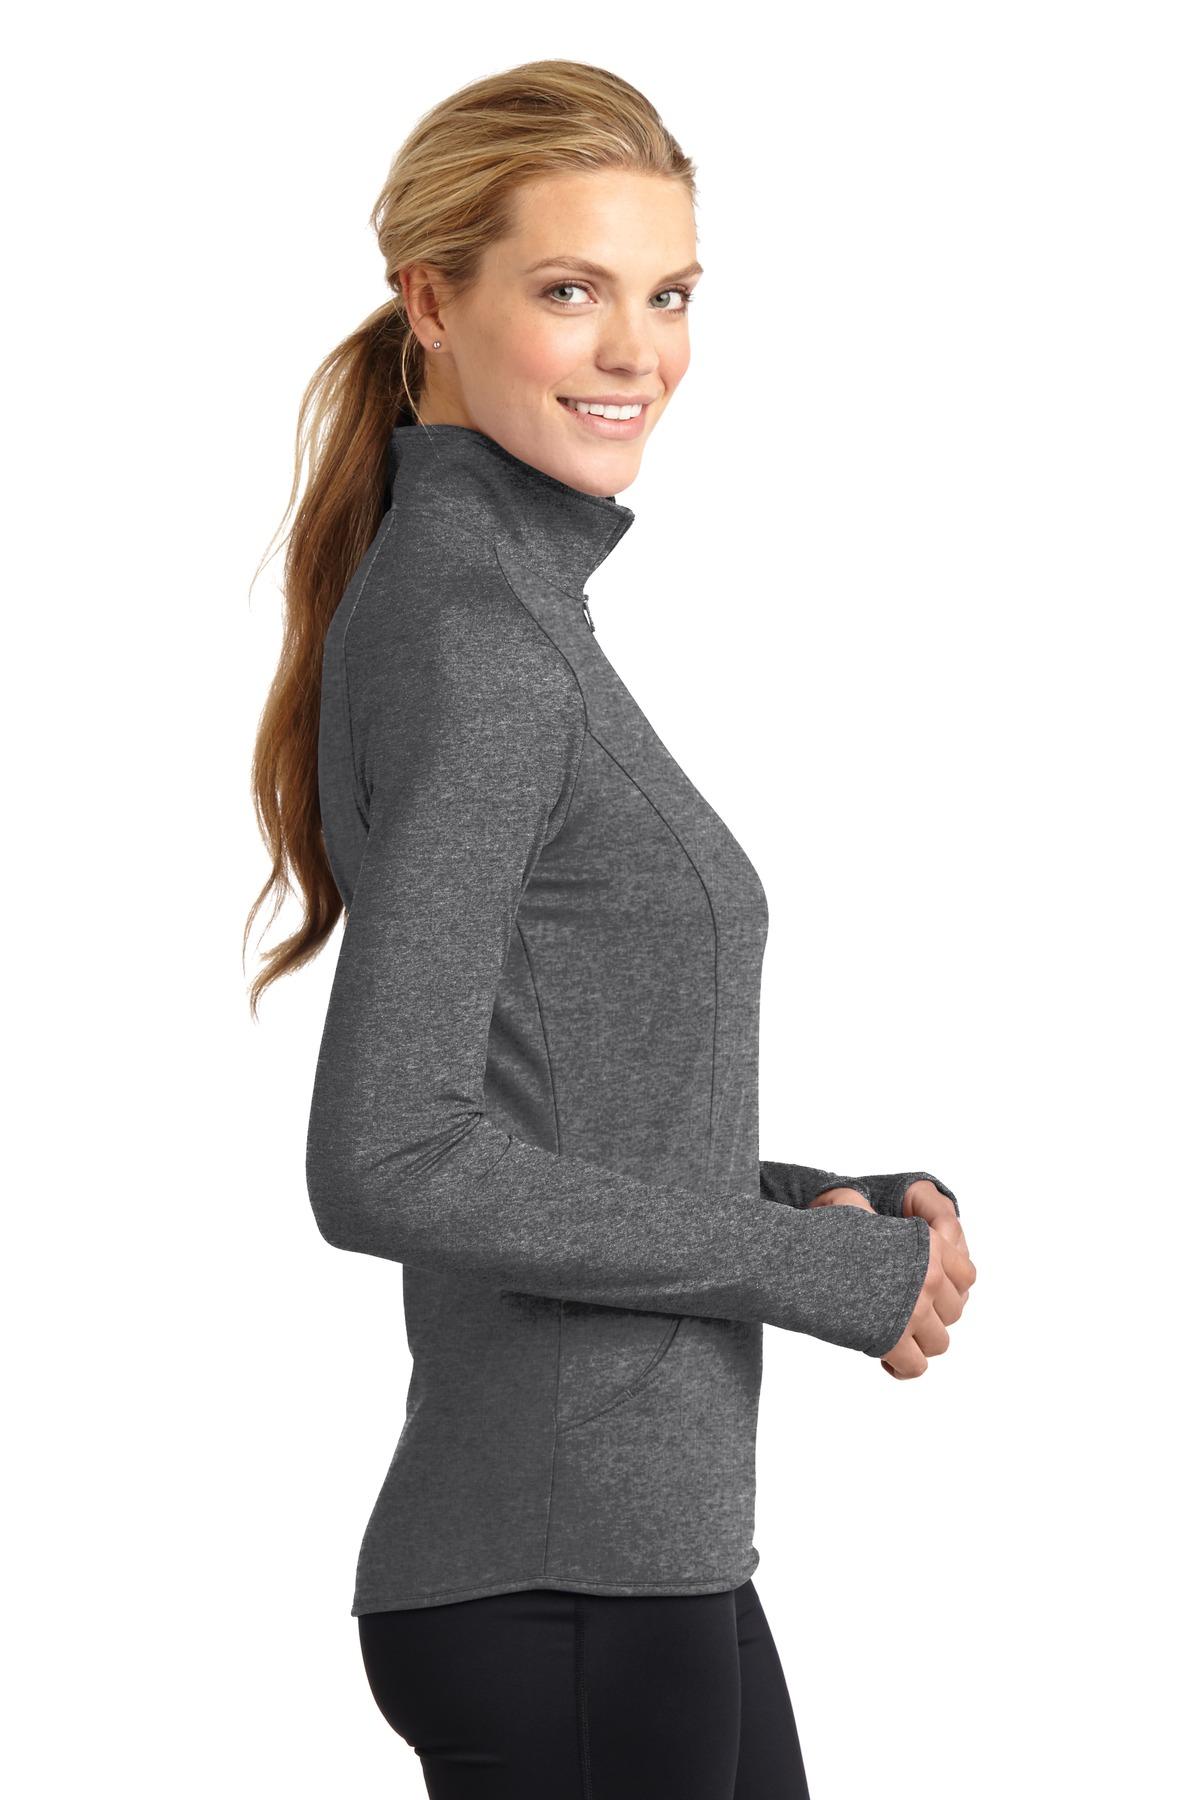 Ladies Sport Stretch 1/2 Zip Pullover - RCL2340